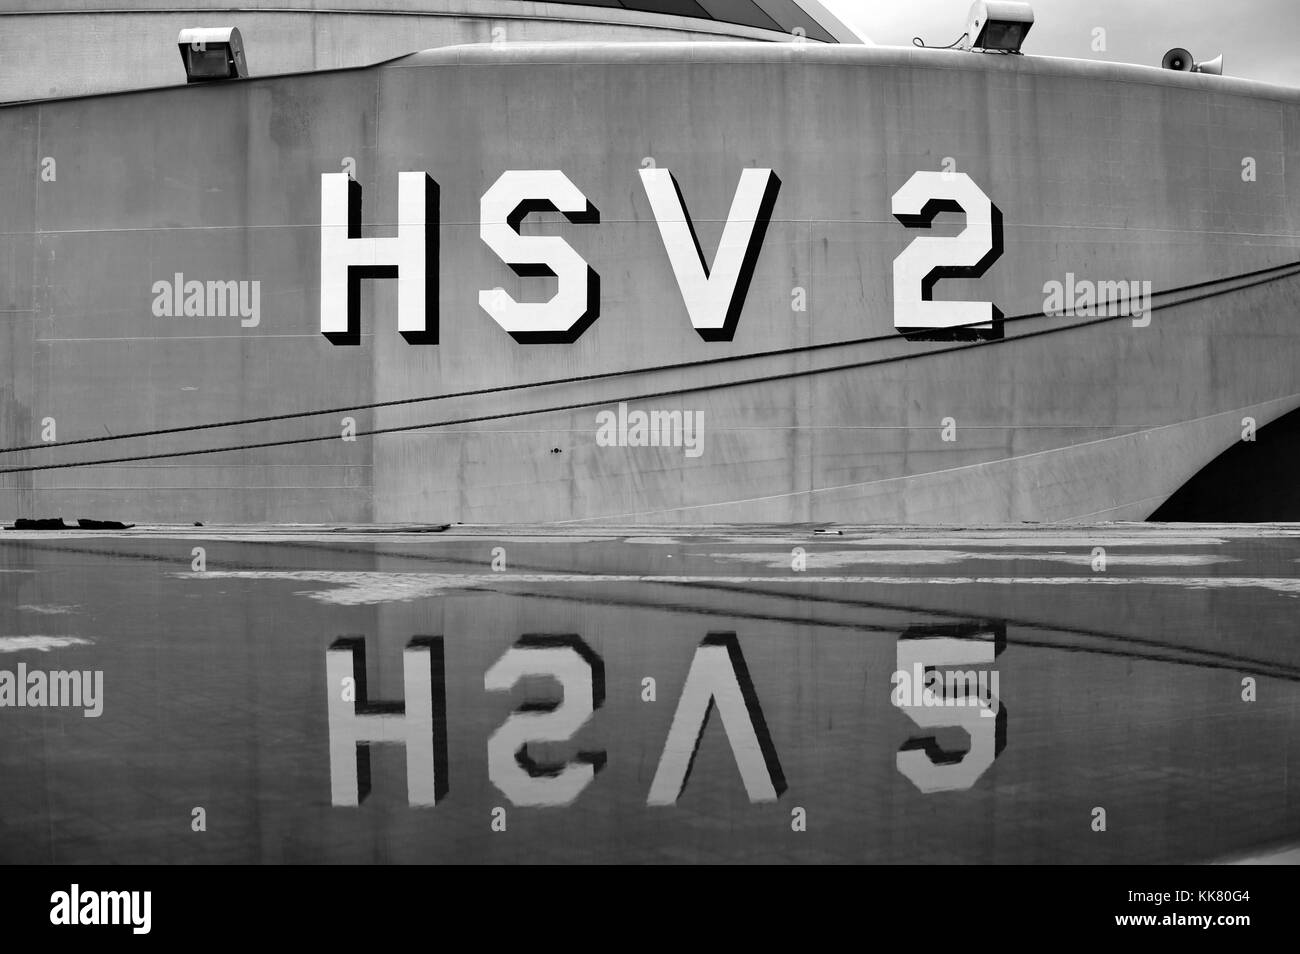 High Speed Vessel Swift HSV 2 arrives in port at Dar Es Salaam to support Africa Partnership Station 2012, Dar Es - Stock Image